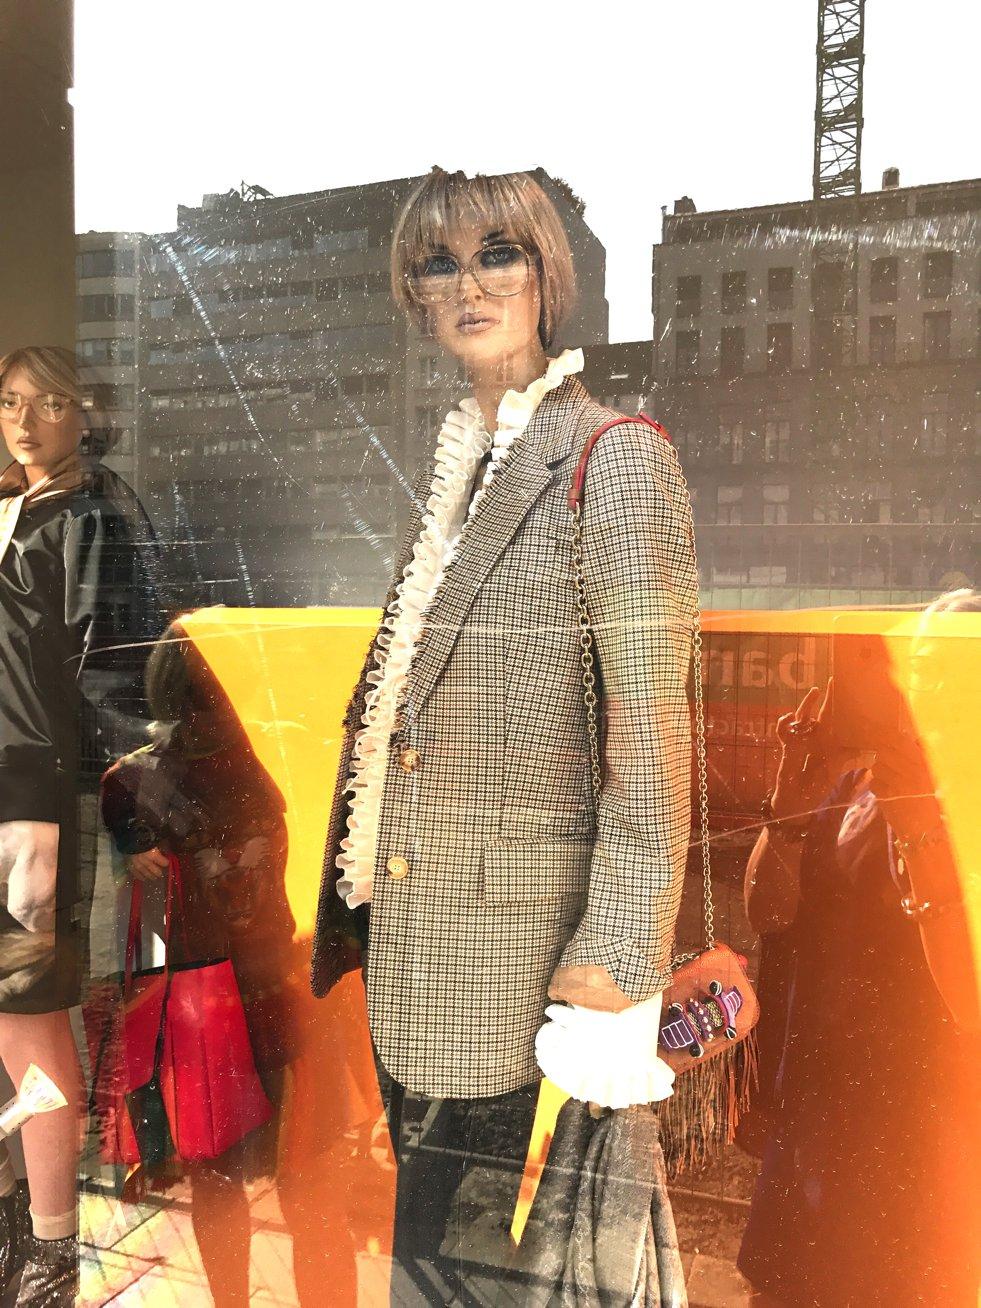 sn3 Antwerp, Grandma Fashion Style, Fashion-Blog, Lieblingsstil.com, , JPG